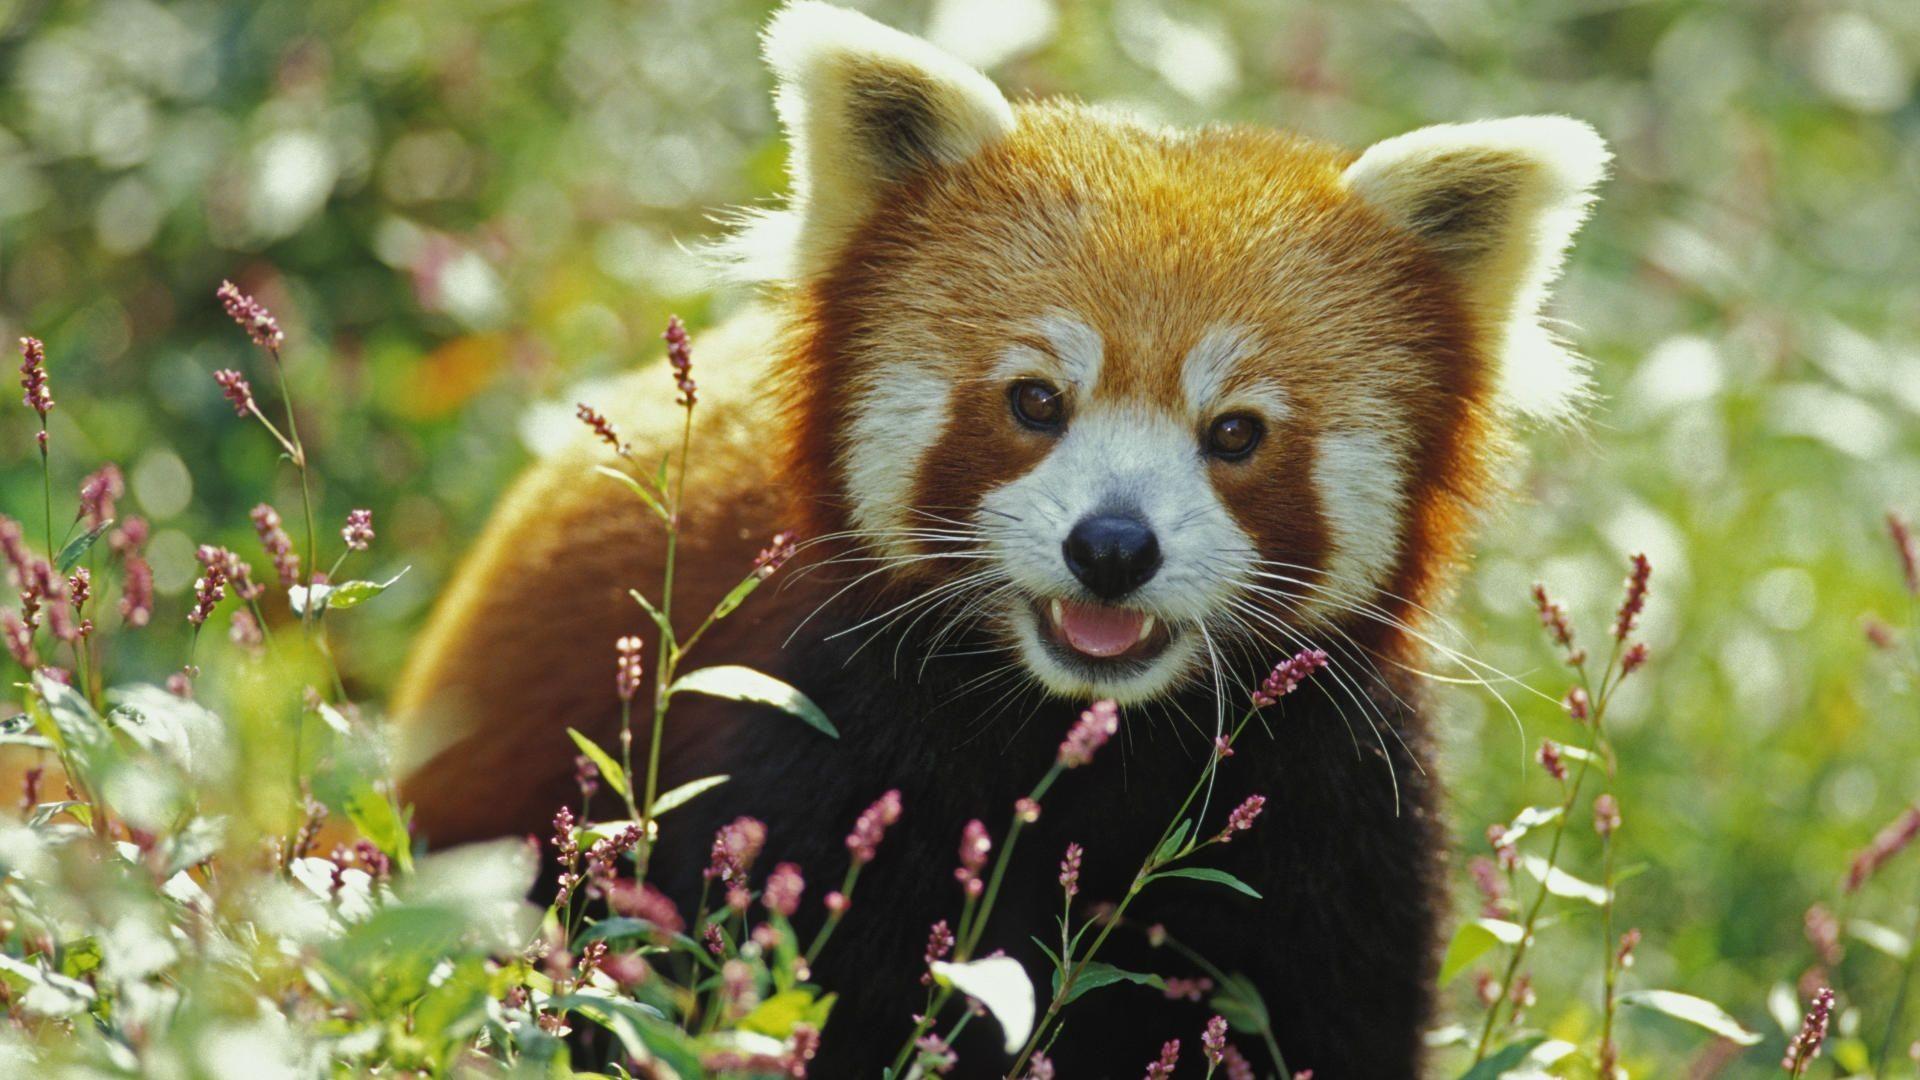 Cute Baby Panda Wallpaper (65+ images) | 1920 x 1080 jpeg 344kB